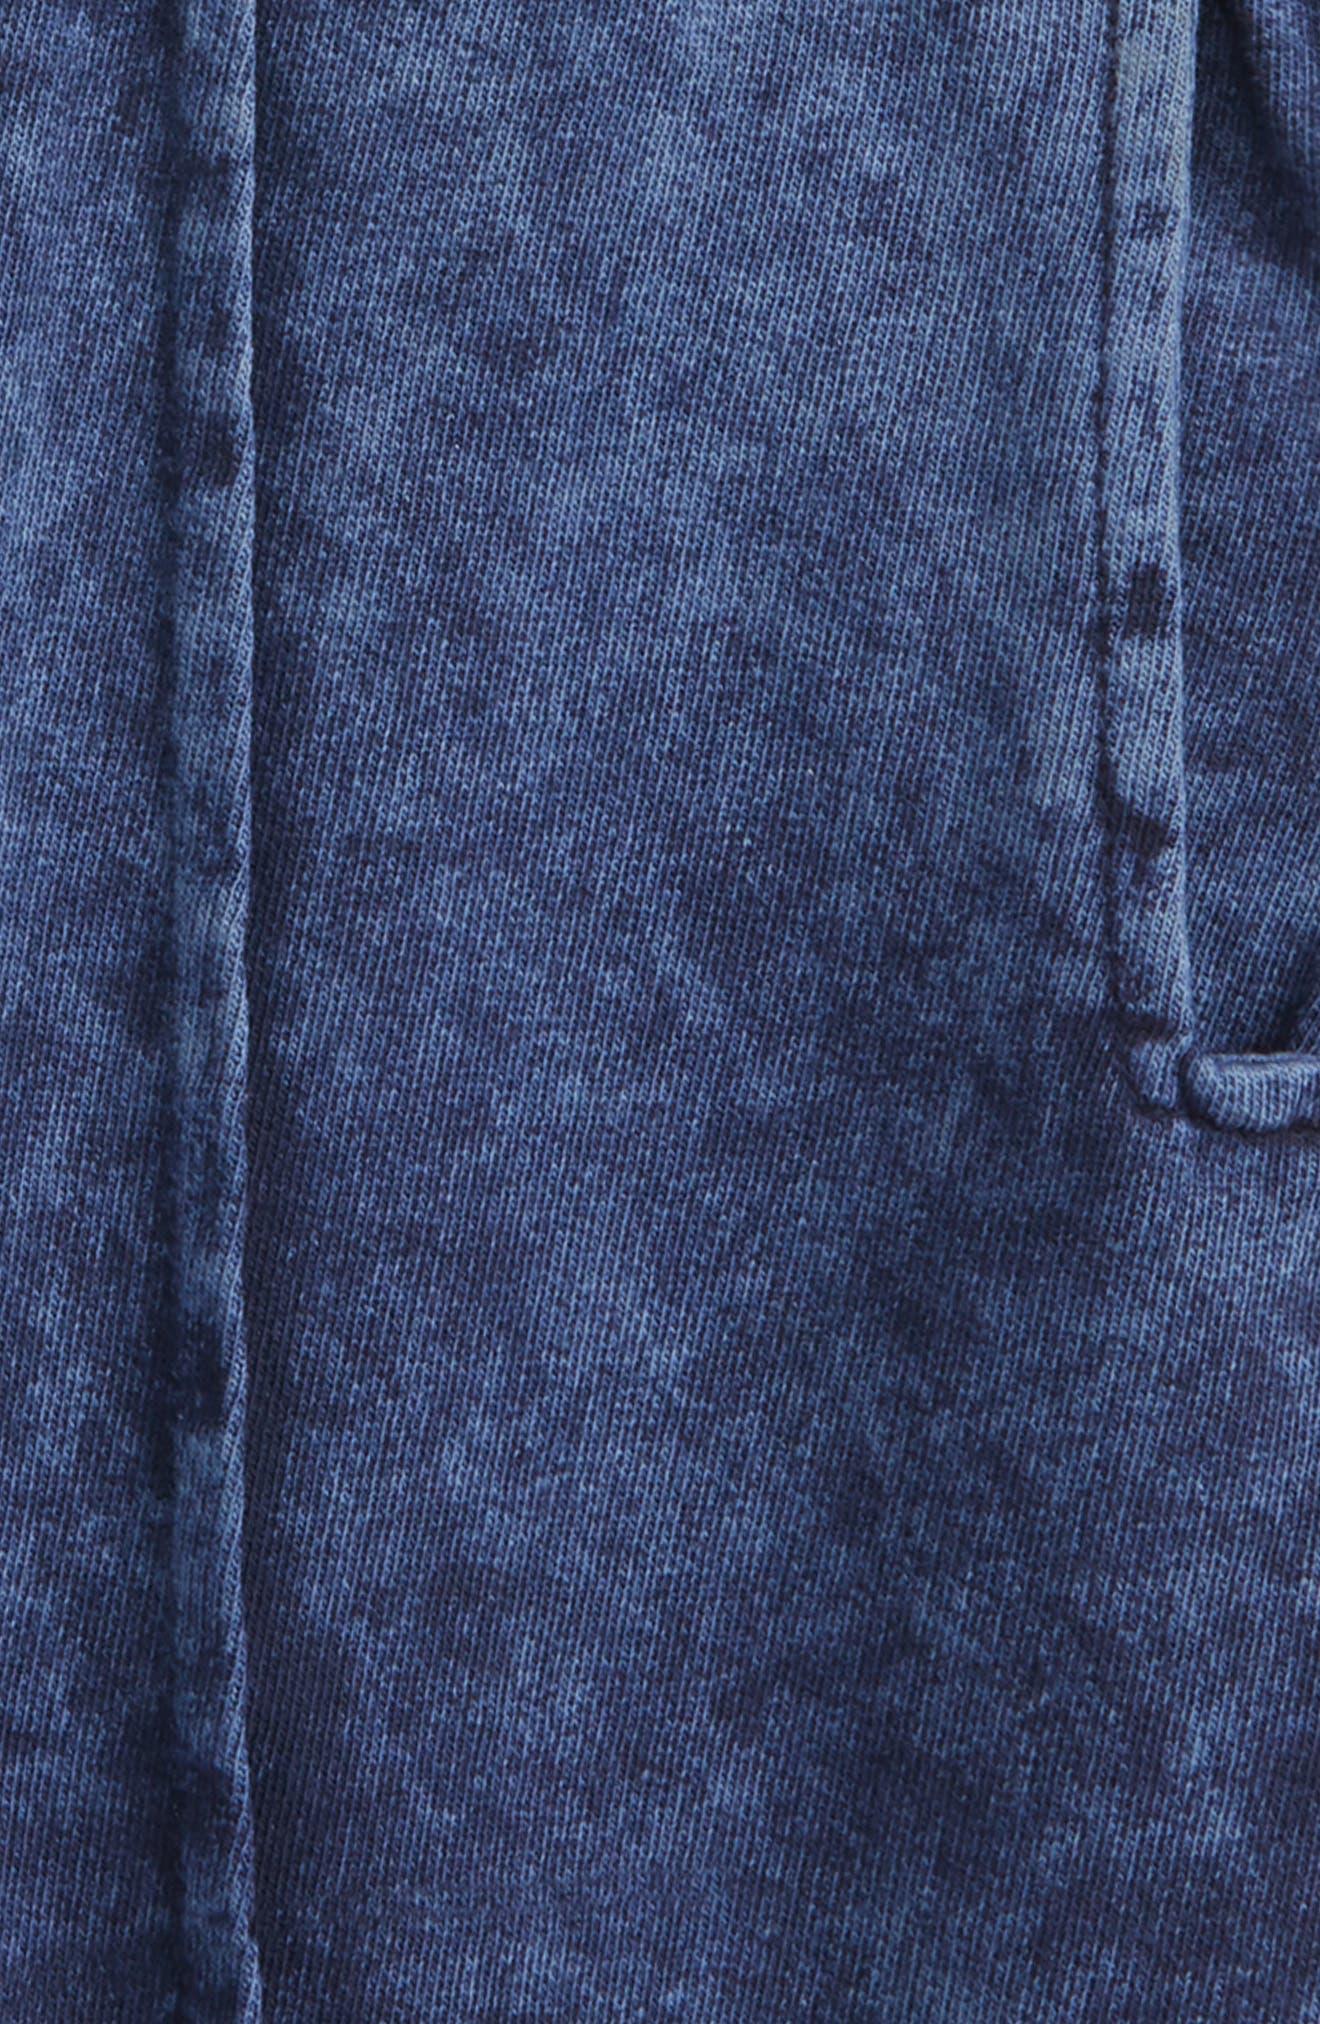 Acid Wash Pull-On Denim Shorts,                             Alternate thumbnail 2, color,                             Navy